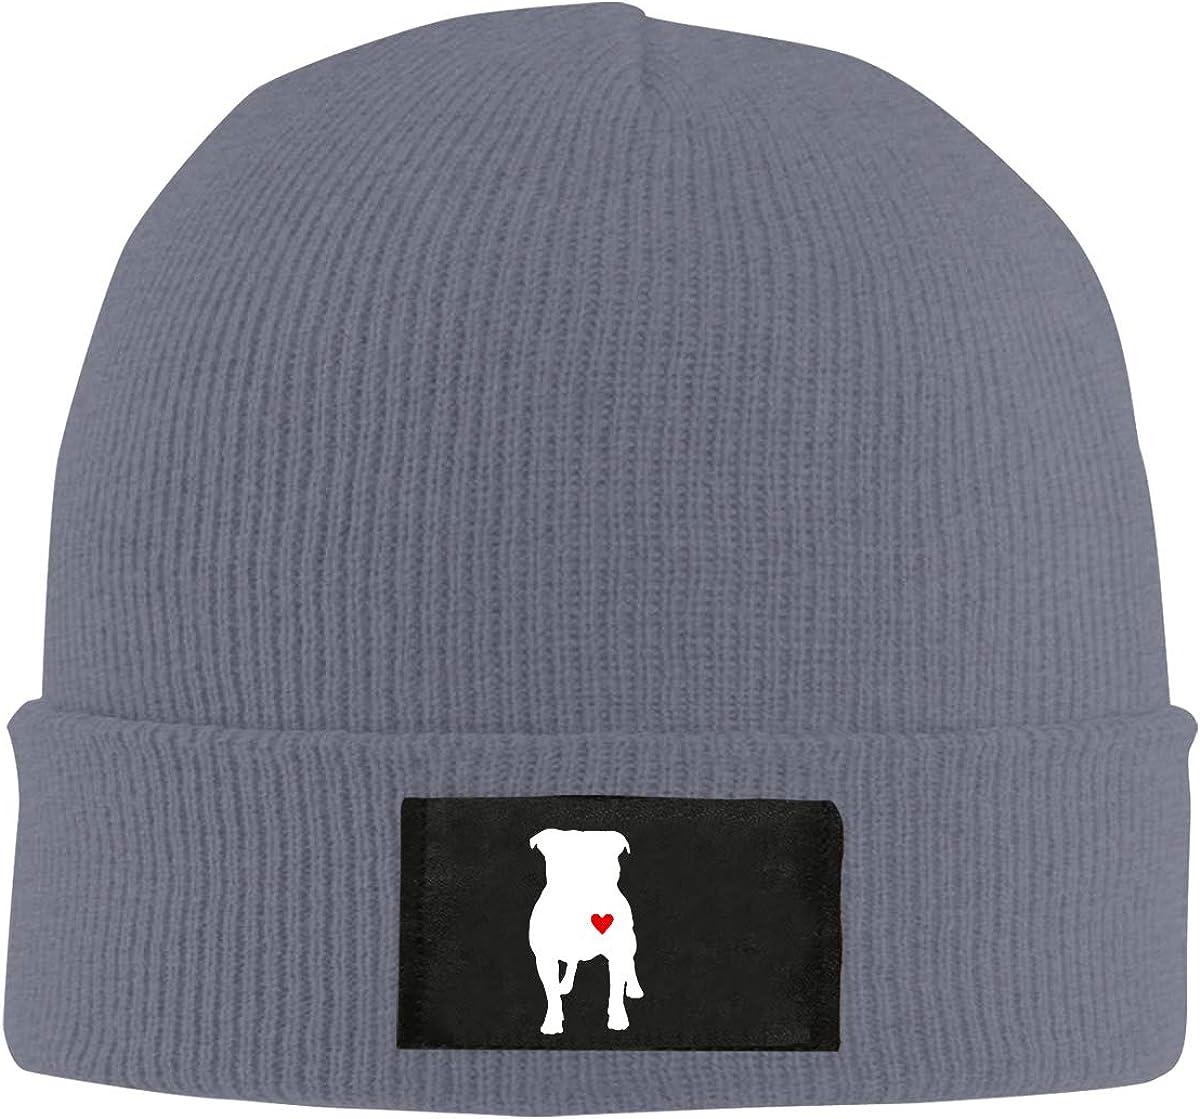 BF5Y6z/&MA Unisex Pitbull Heart Knitting Hat 100/% Acrylic Fashion Beanies Cap